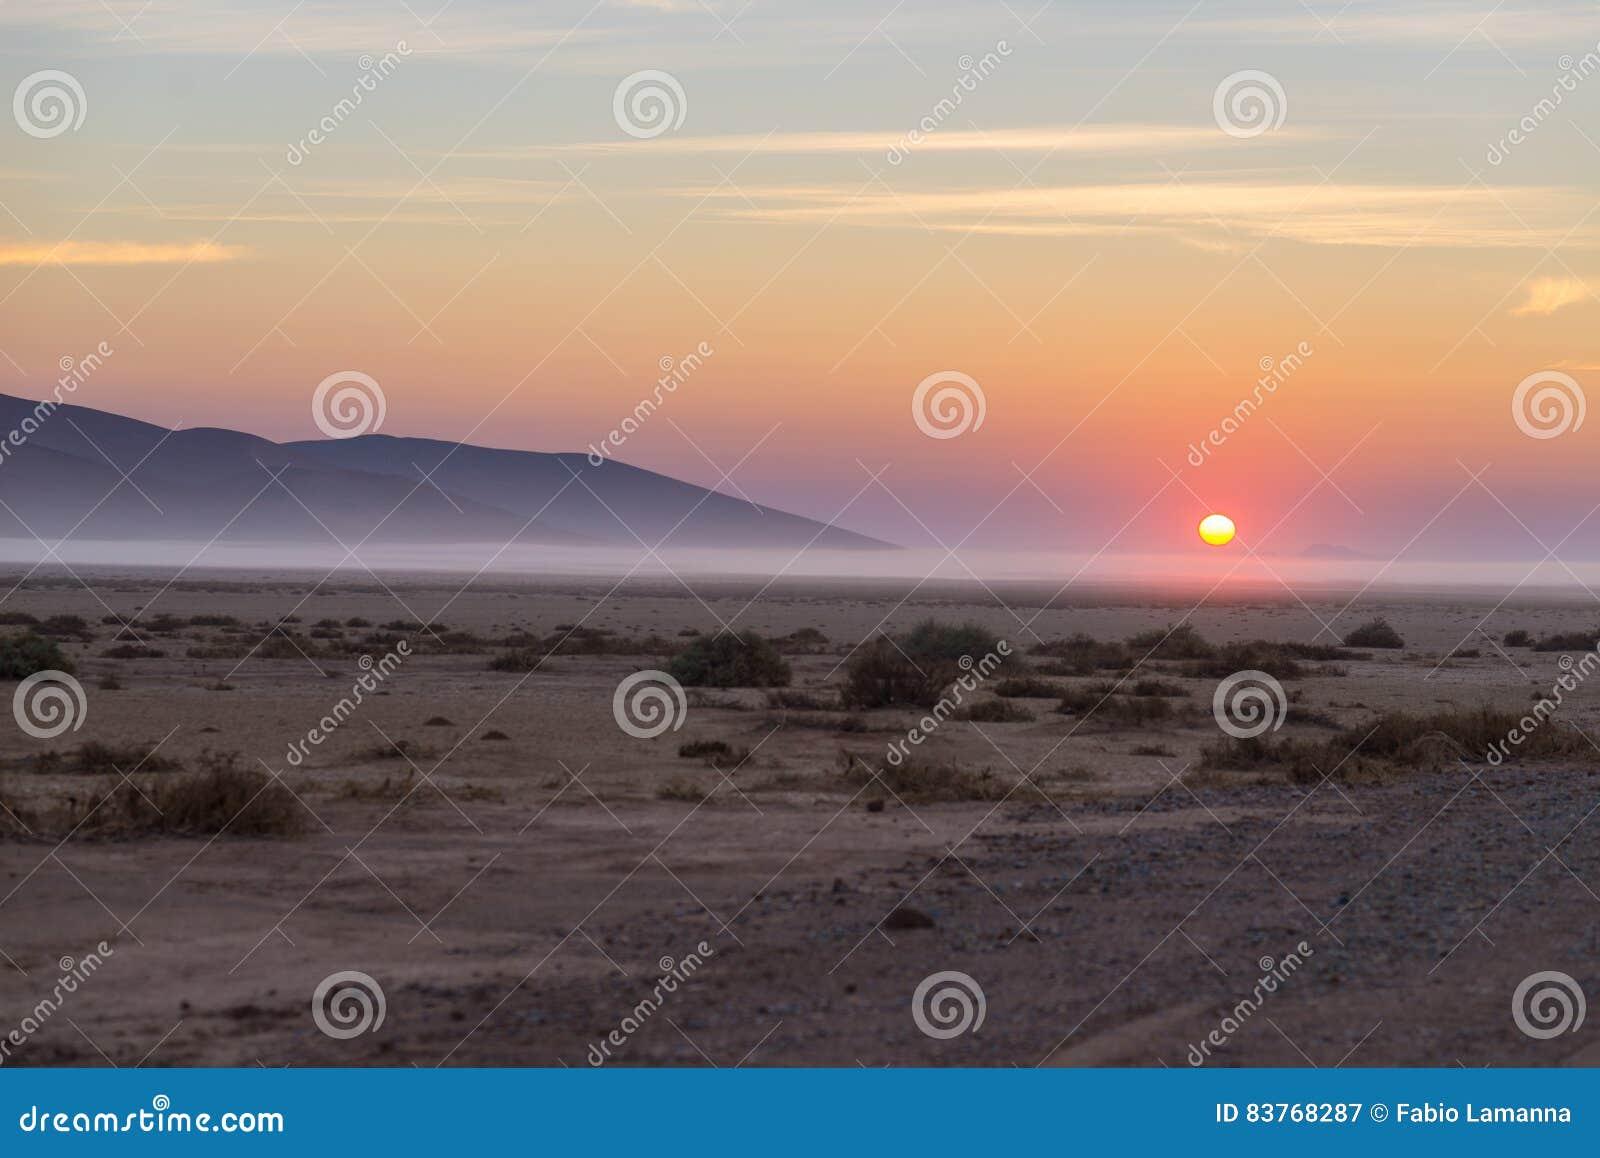 Salida del sol sobre el desierto de Namib, roadtrip en el parque nacional maravilloso de Namib Naukluft, destino del viaje en Nam